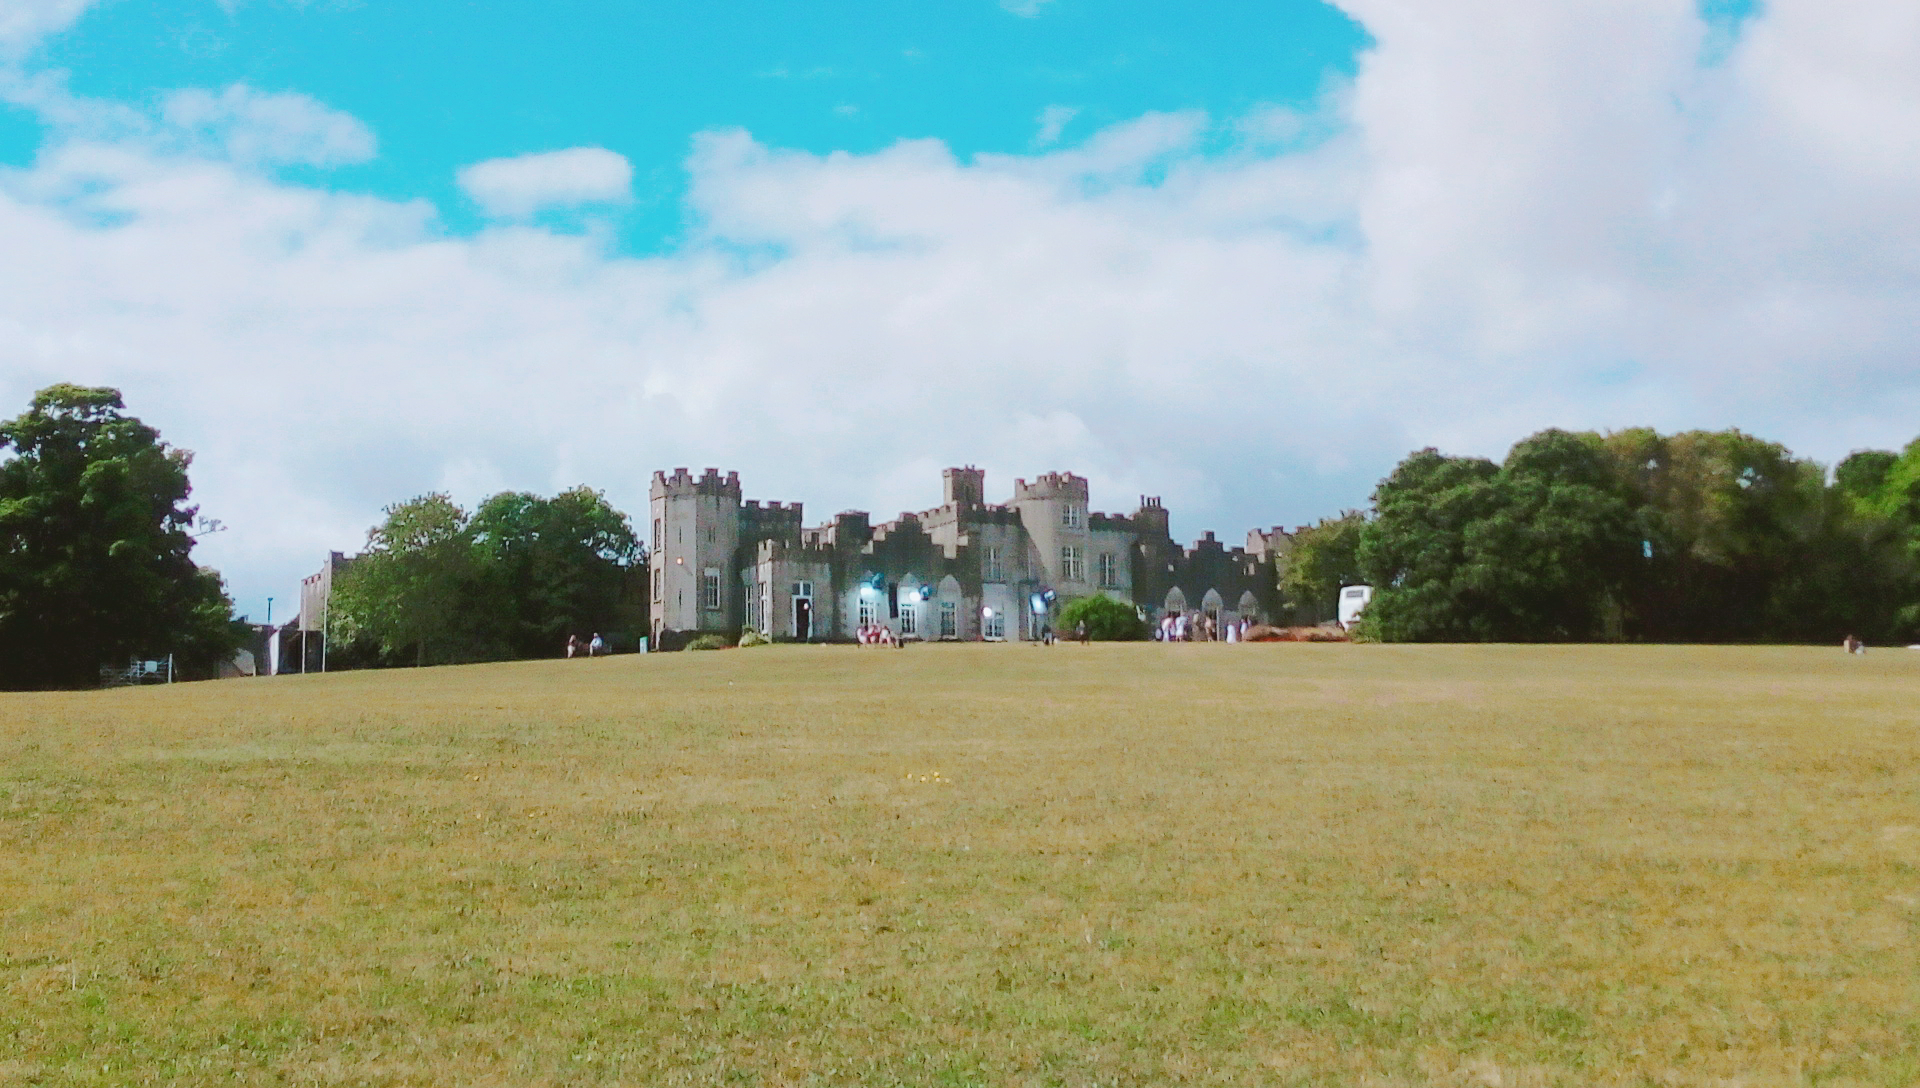 Ardgillan Castle and Demesne